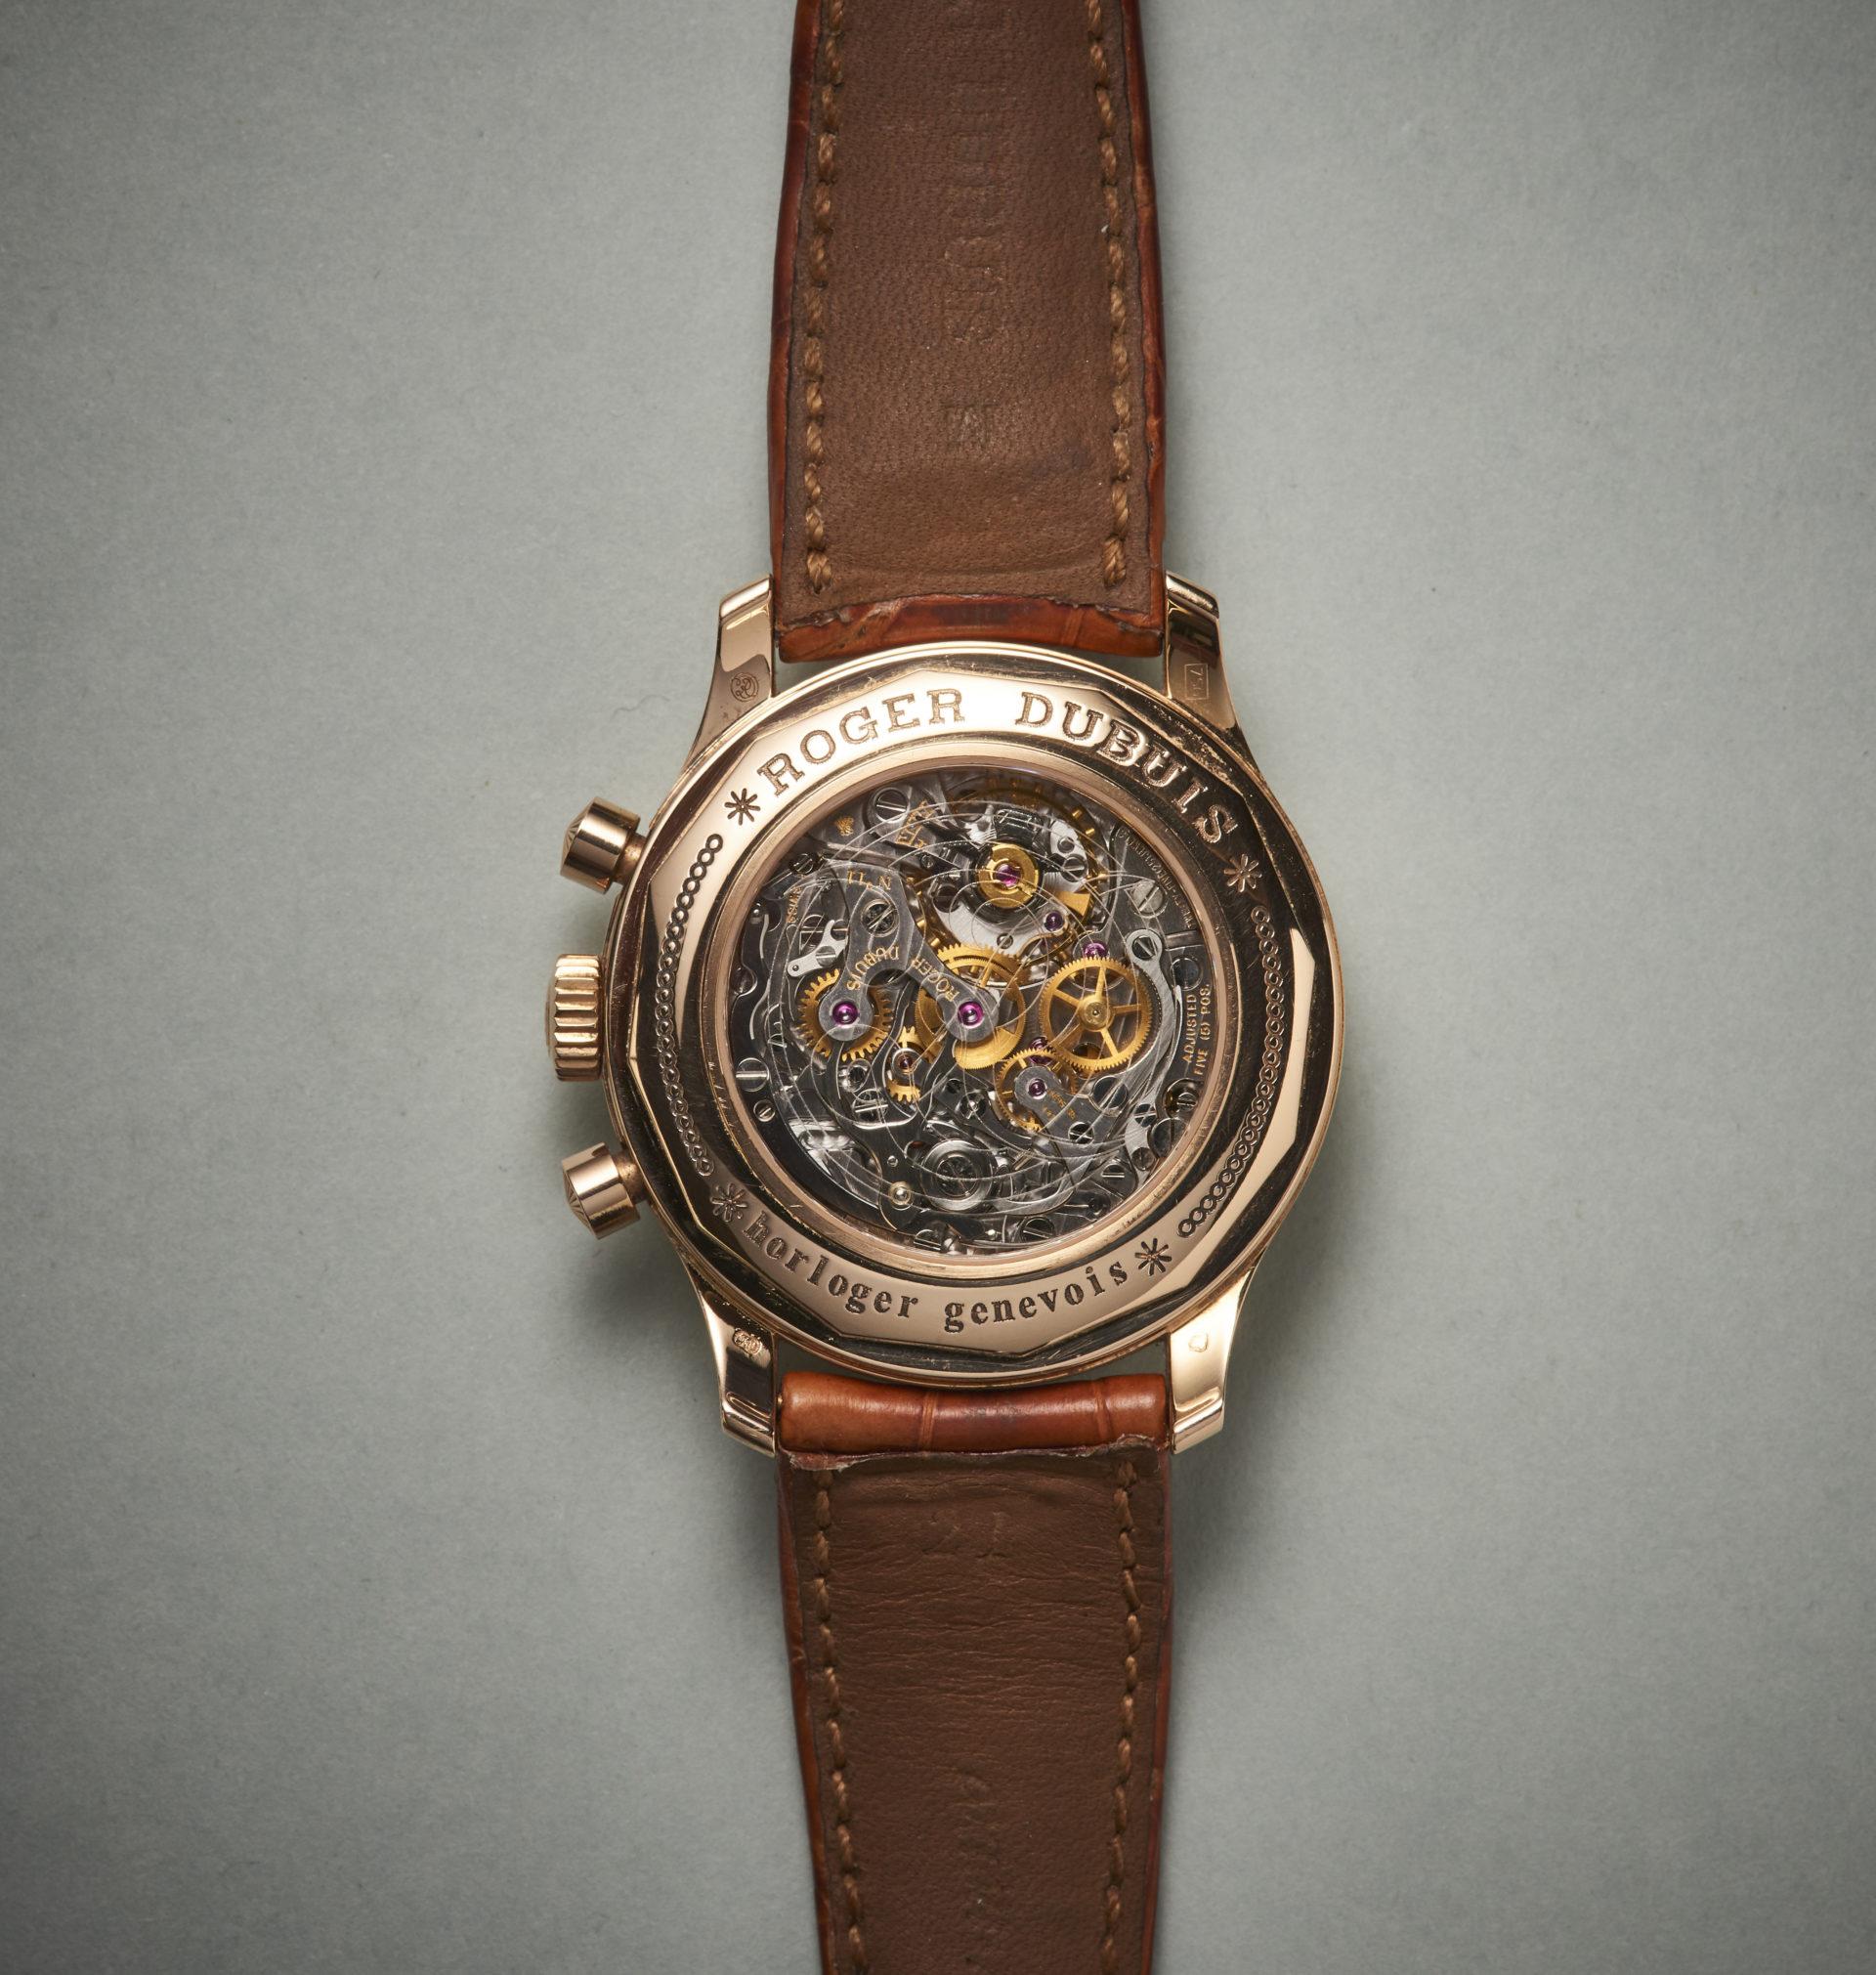 Roger Dubuis Hommage Chronograph Datum Wochentag retrograd ca 1997 2 Foto GLB